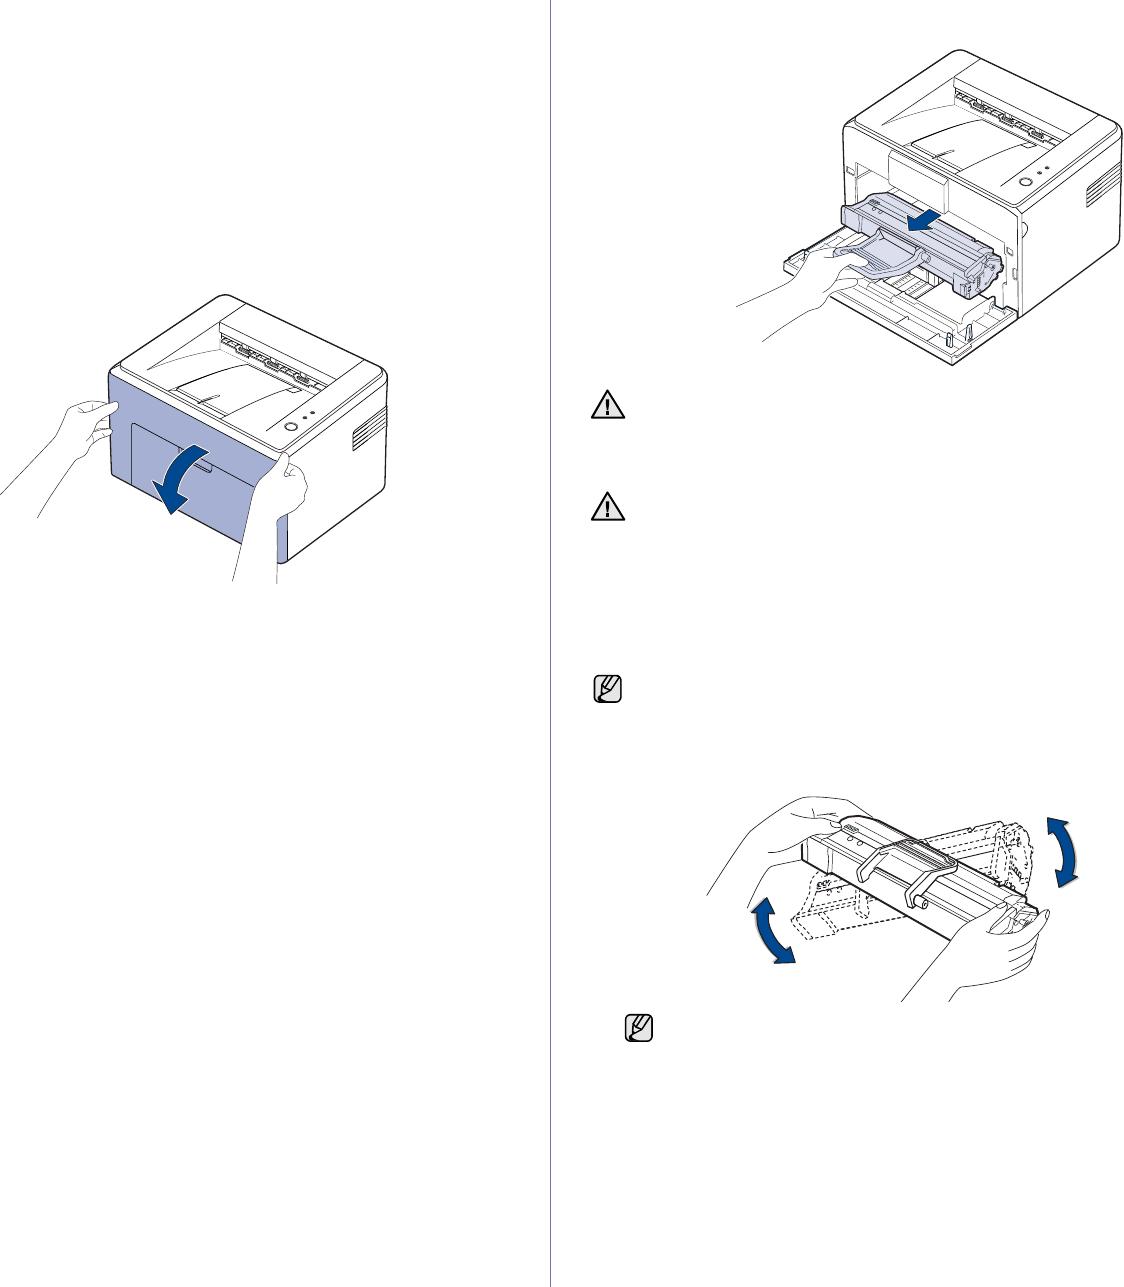 Samsung Electronics Co ML1640 Laser Printer User Manual